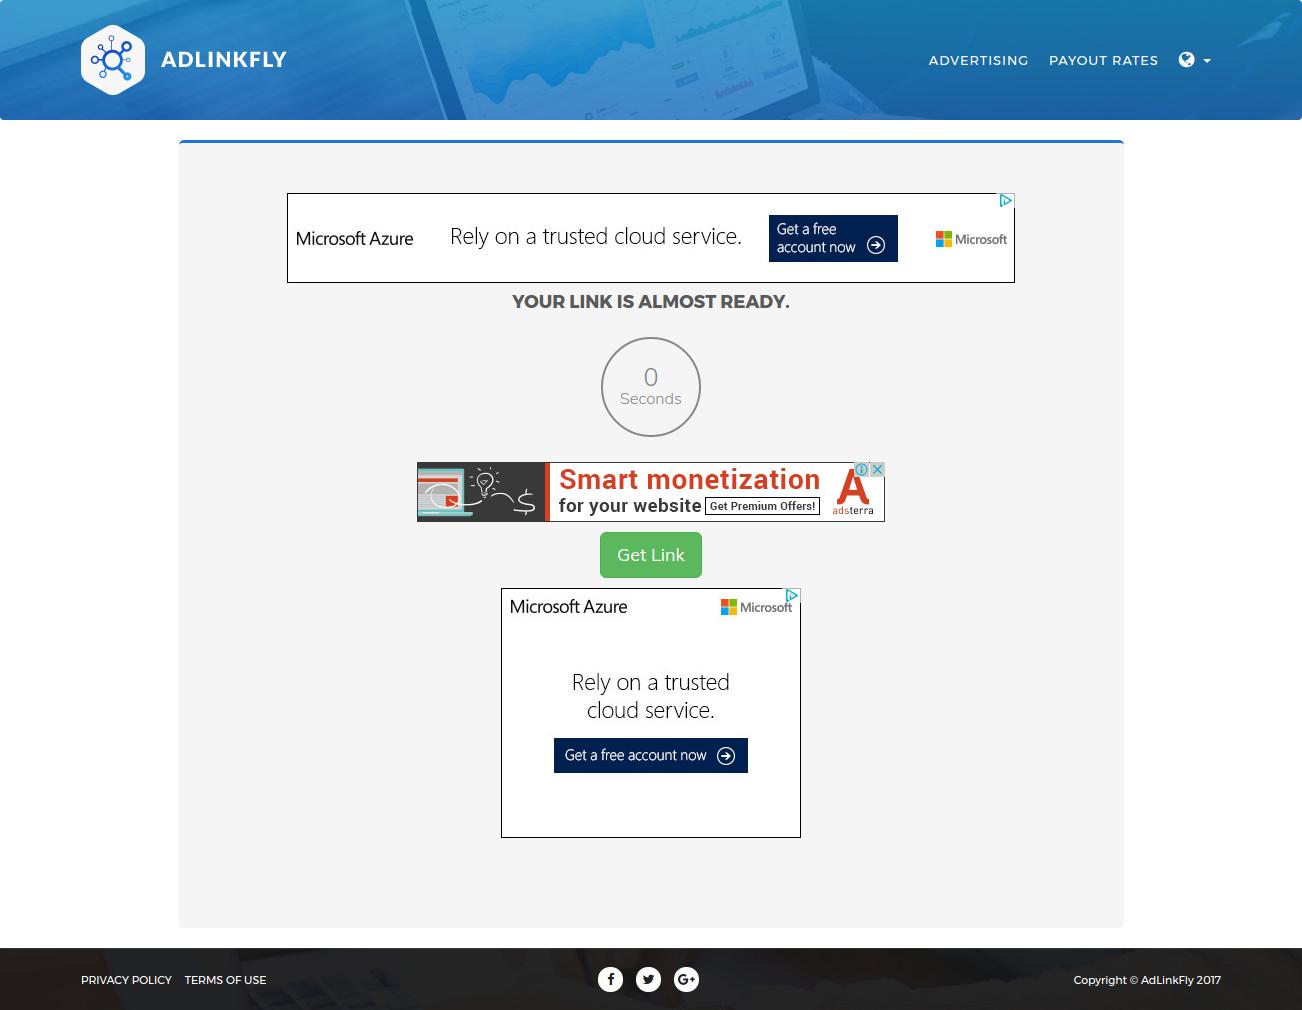 AdLinkFly - Gana dinero acortando URLs 7